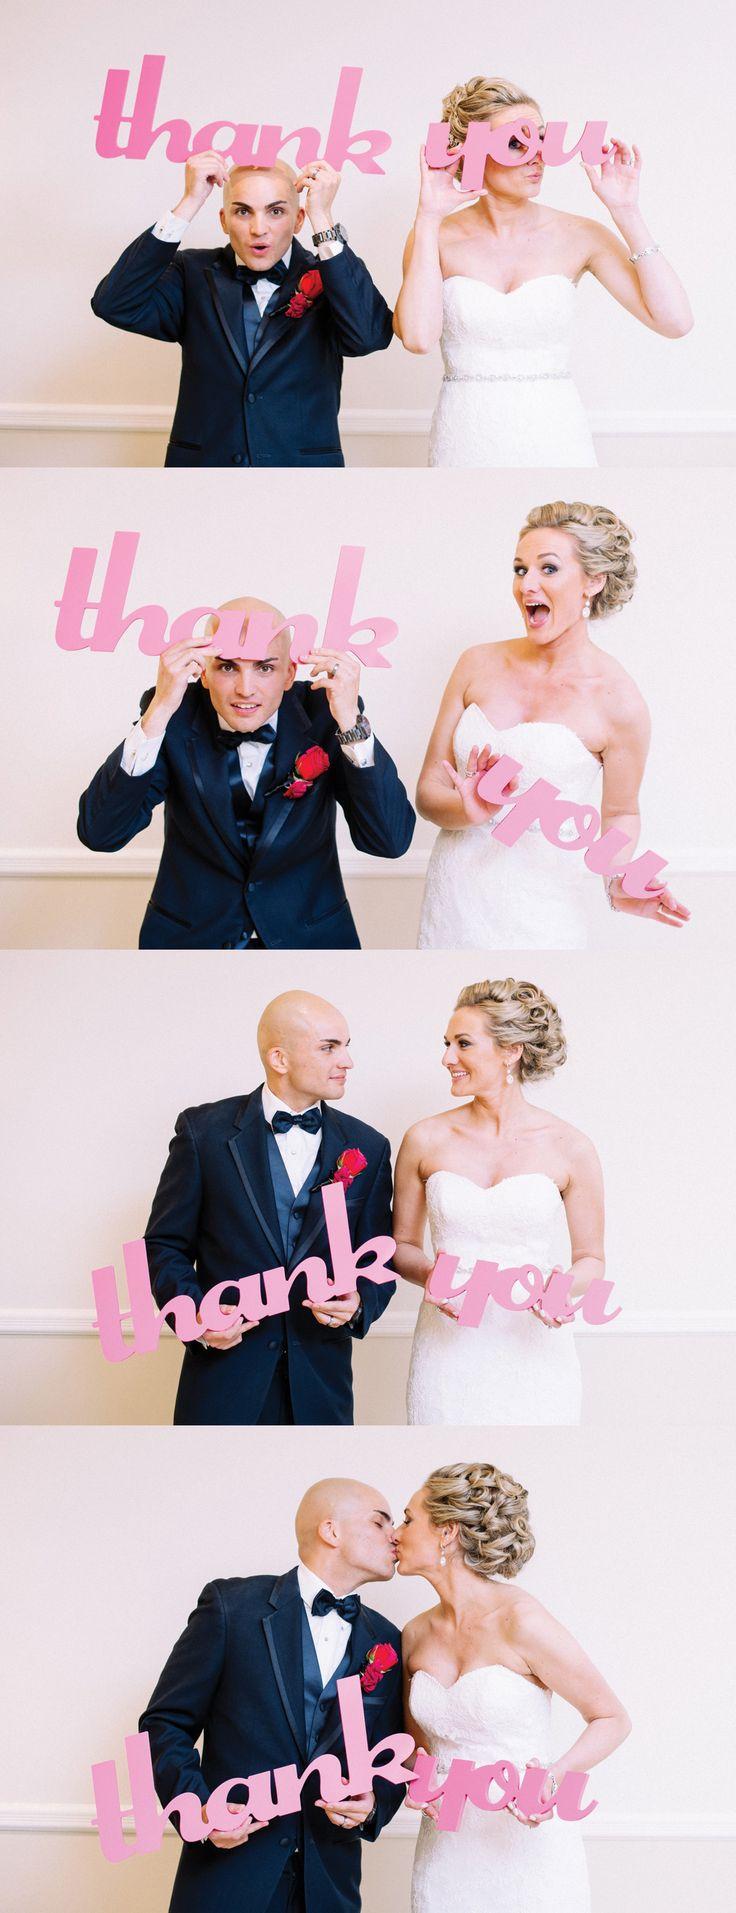 What a cute wedding thank you card idea!  Sign by Z Create Design @ www.ZCreateDesign.com